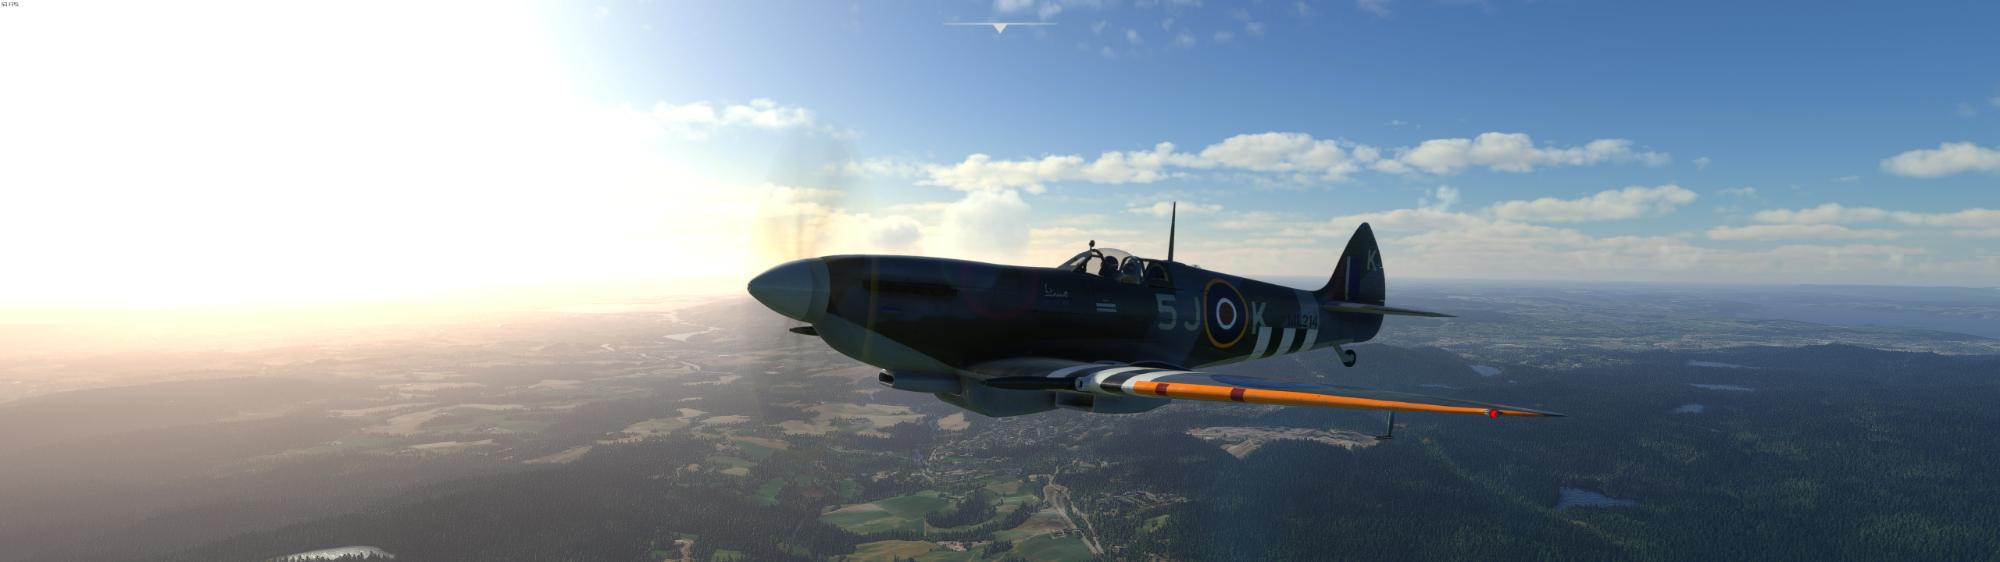 Microsoft Flight Simulator - 1.18.15.0 8_28_2021 10_15_19 AM.png